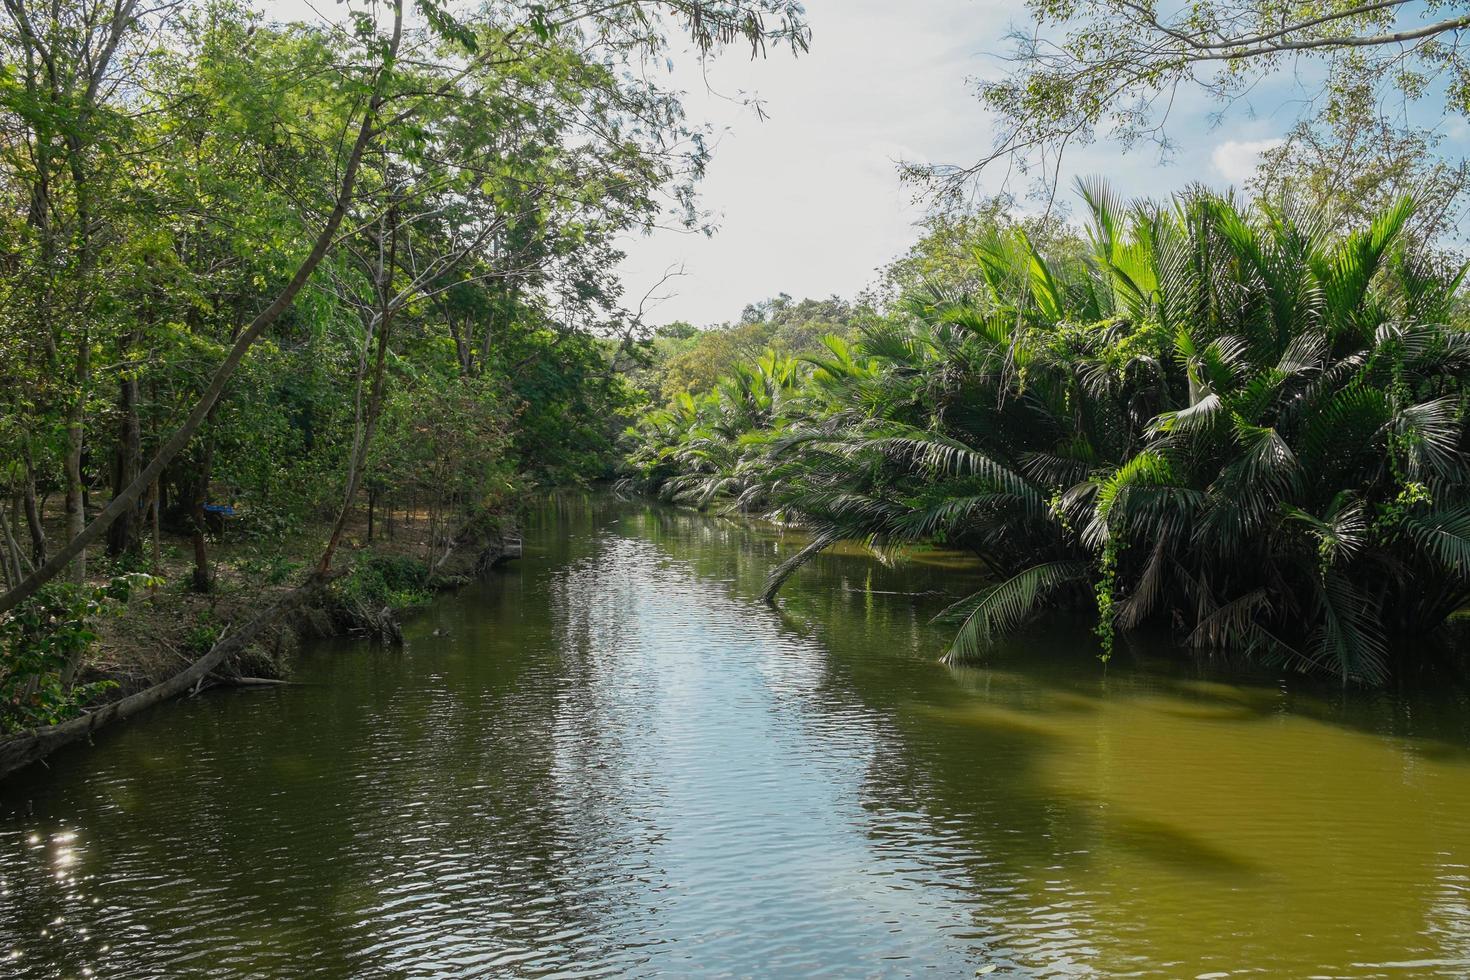 Ruisseau qui coule à travers la palmeraie de Nipa photo